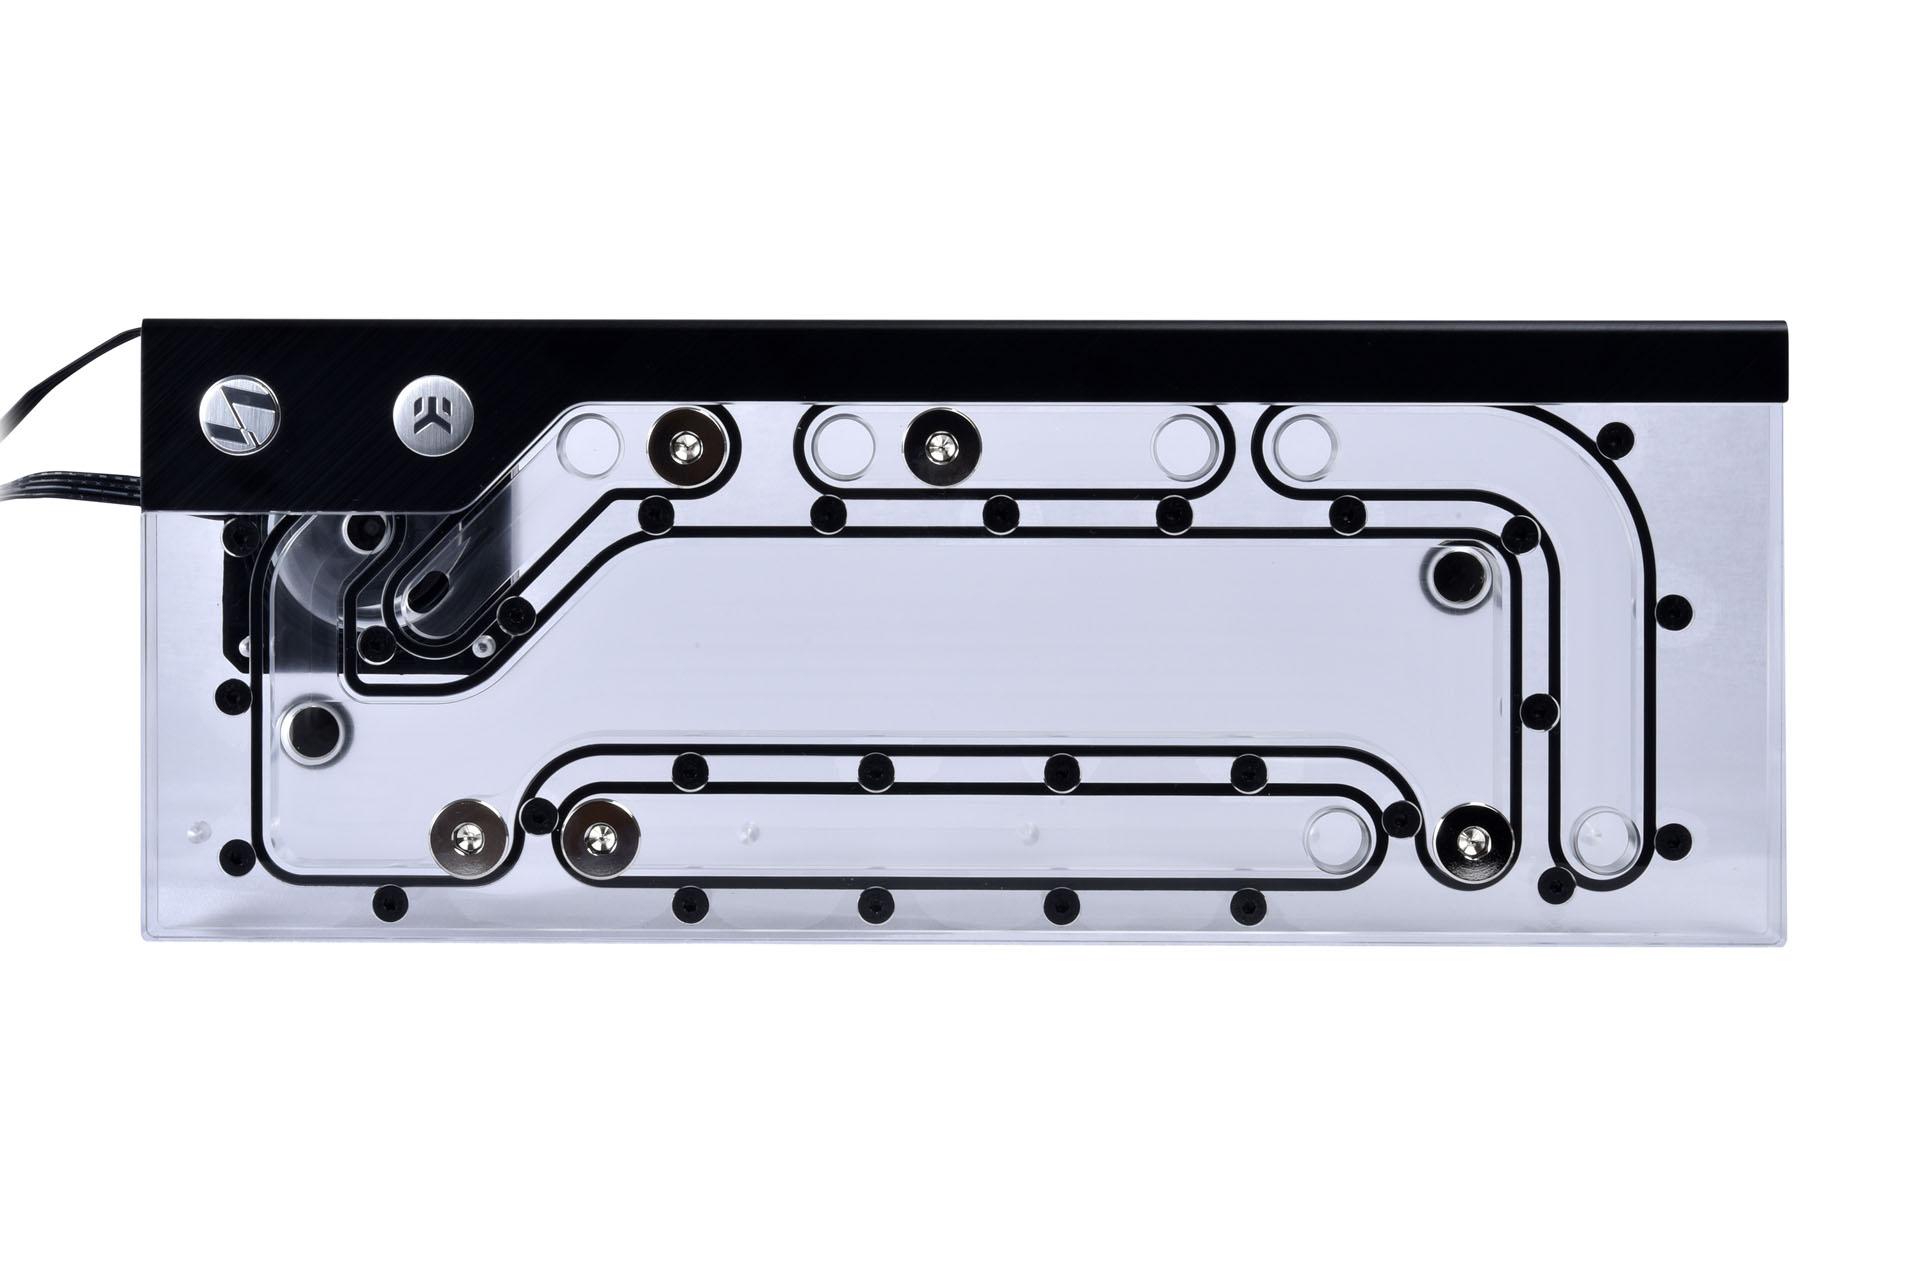 O11D-distro-plate-G1-Ek-lian-li-waterway-21